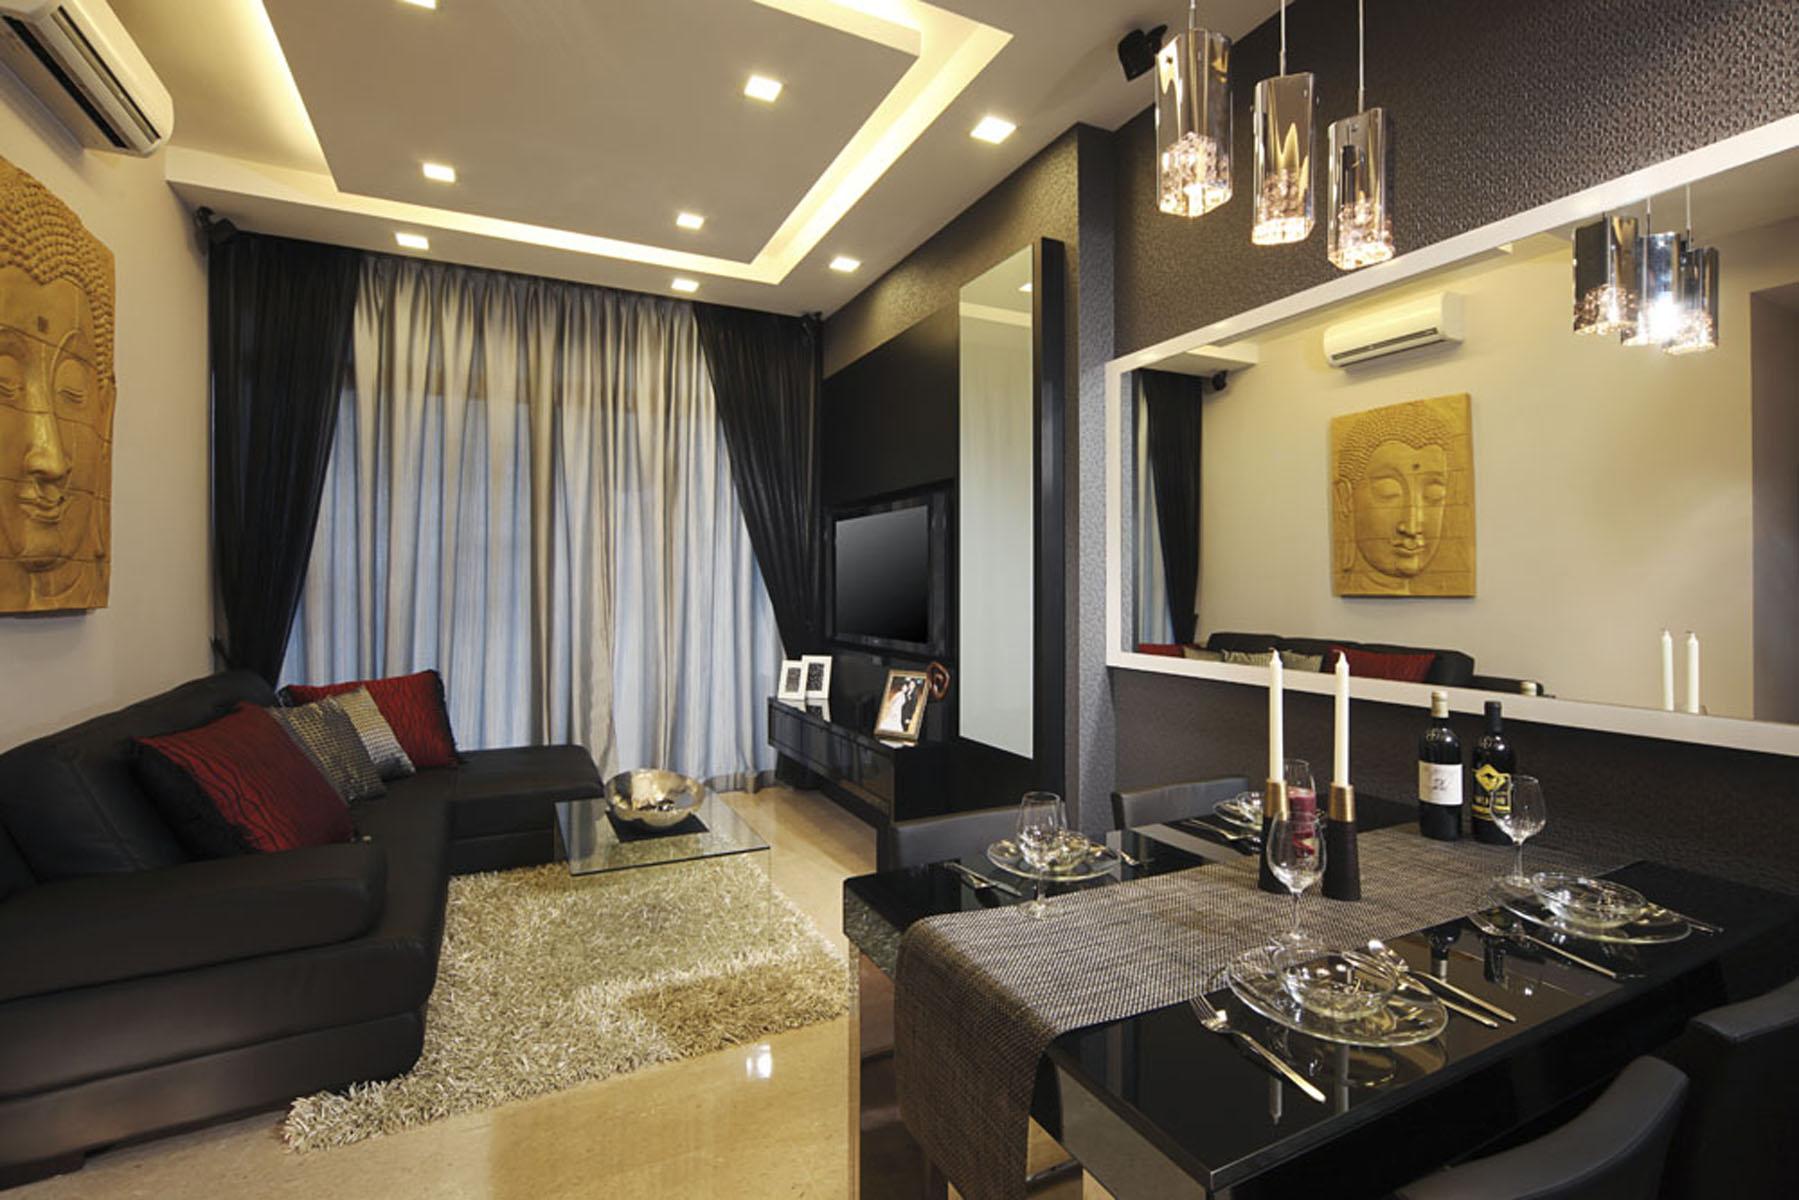 Living room decoration and design company singapore - Design your living room ...